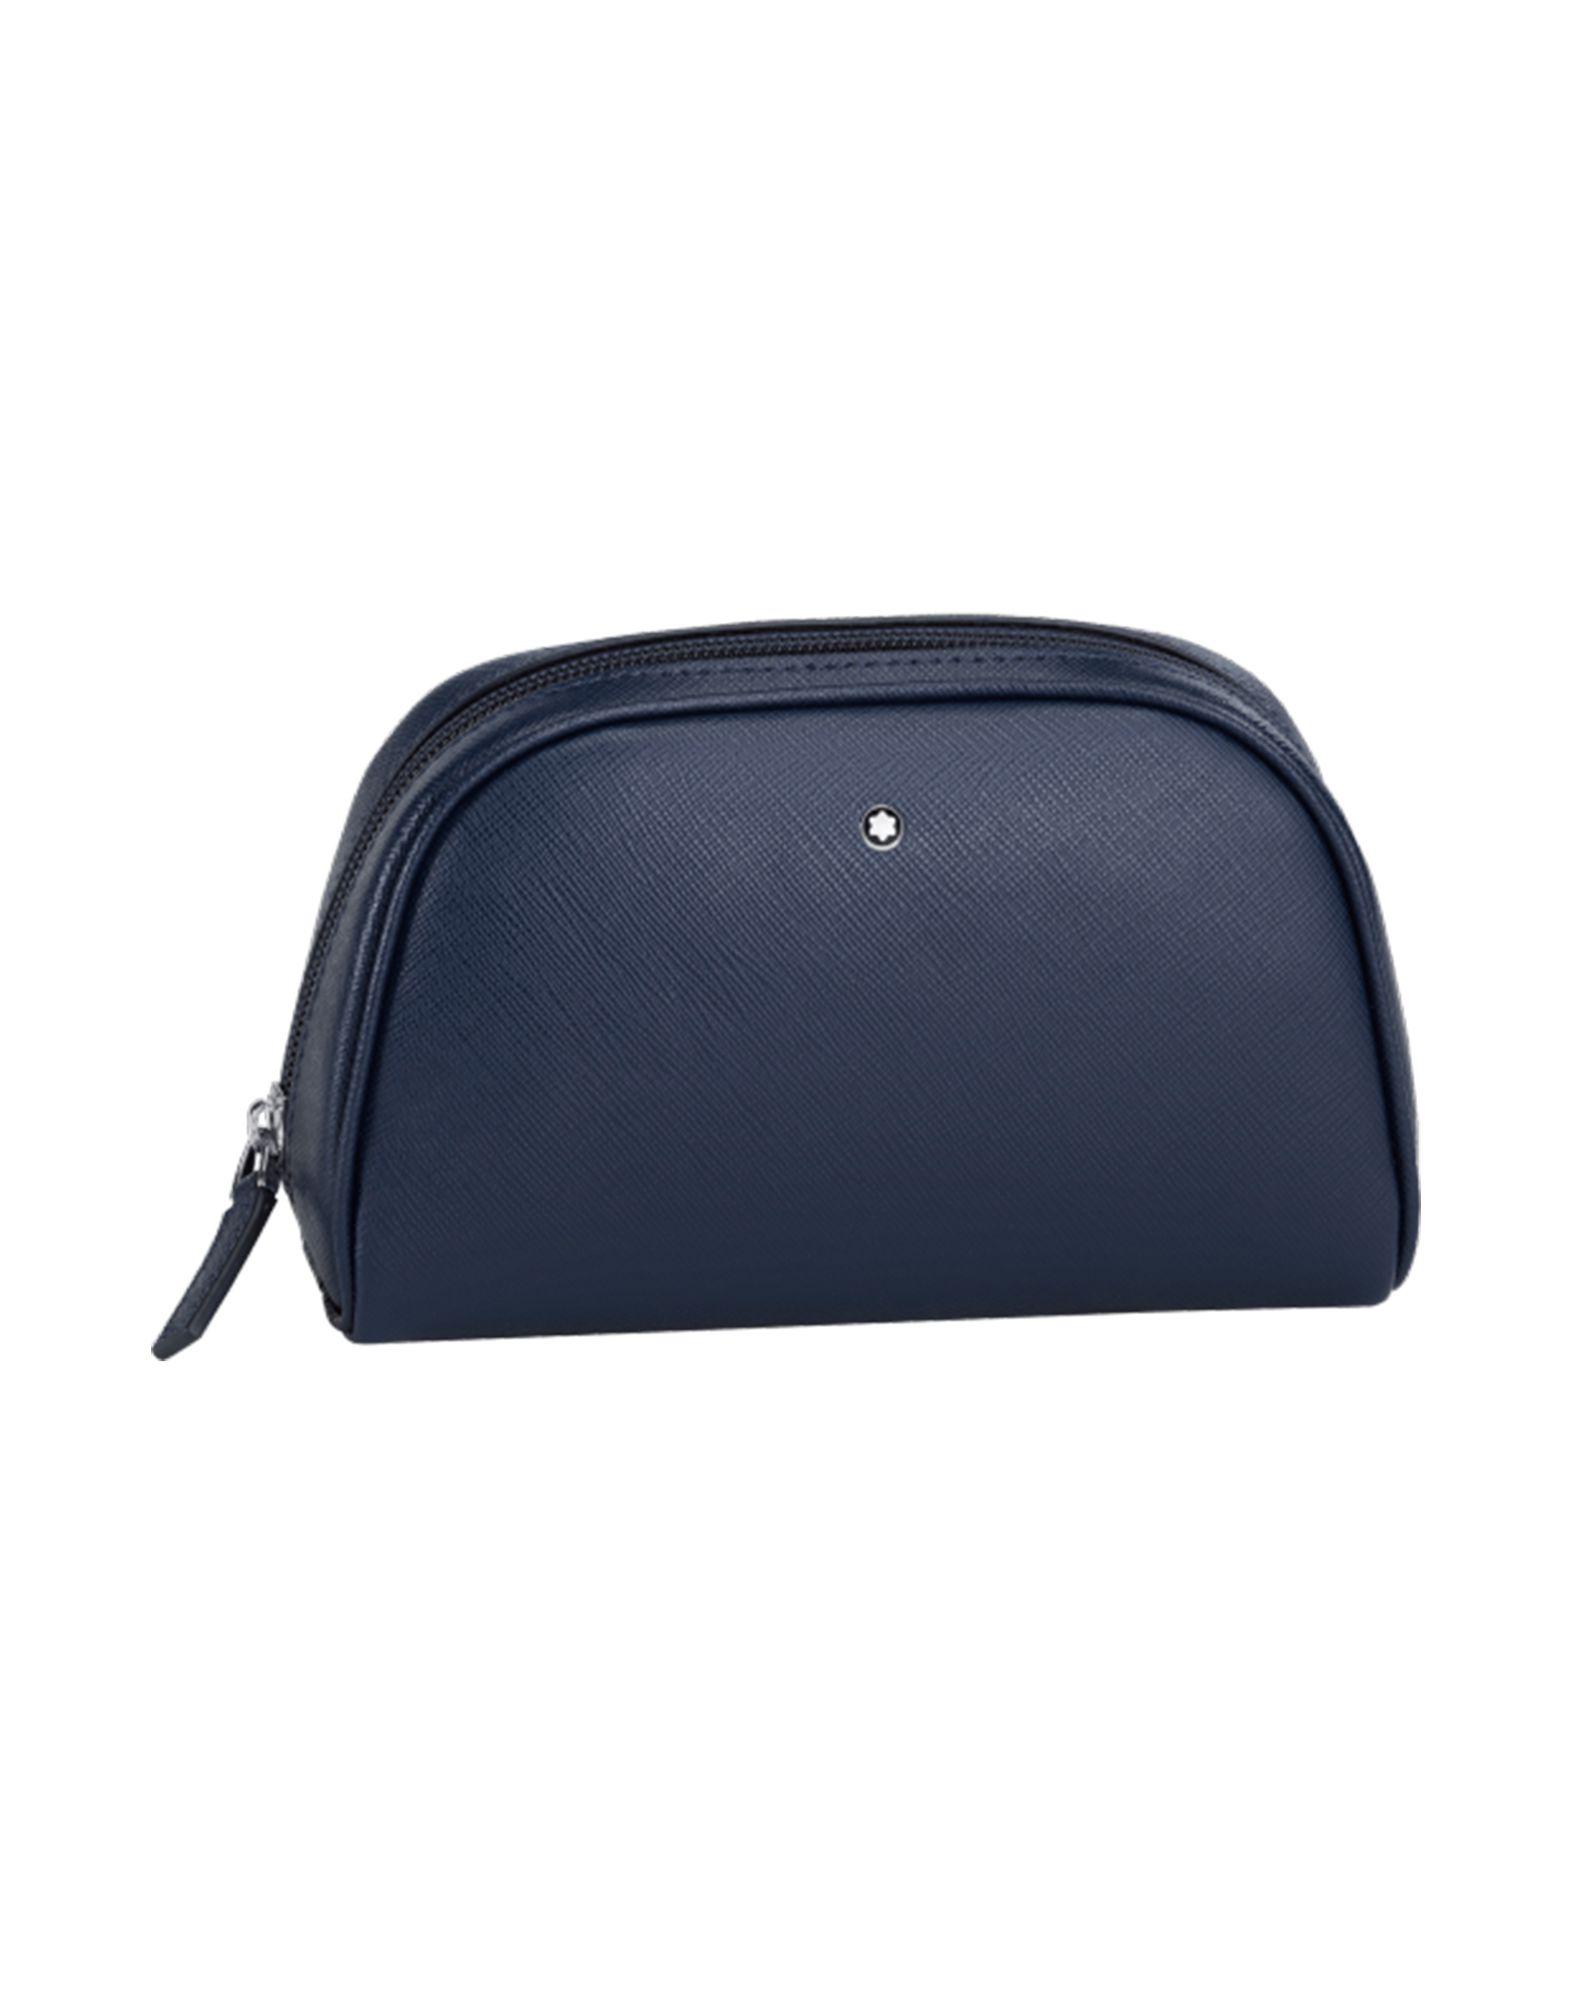 c2899e057b70 Montblanc Mb Sartorial Vanity Bag Large Indigo - Beauty Case - Men ...